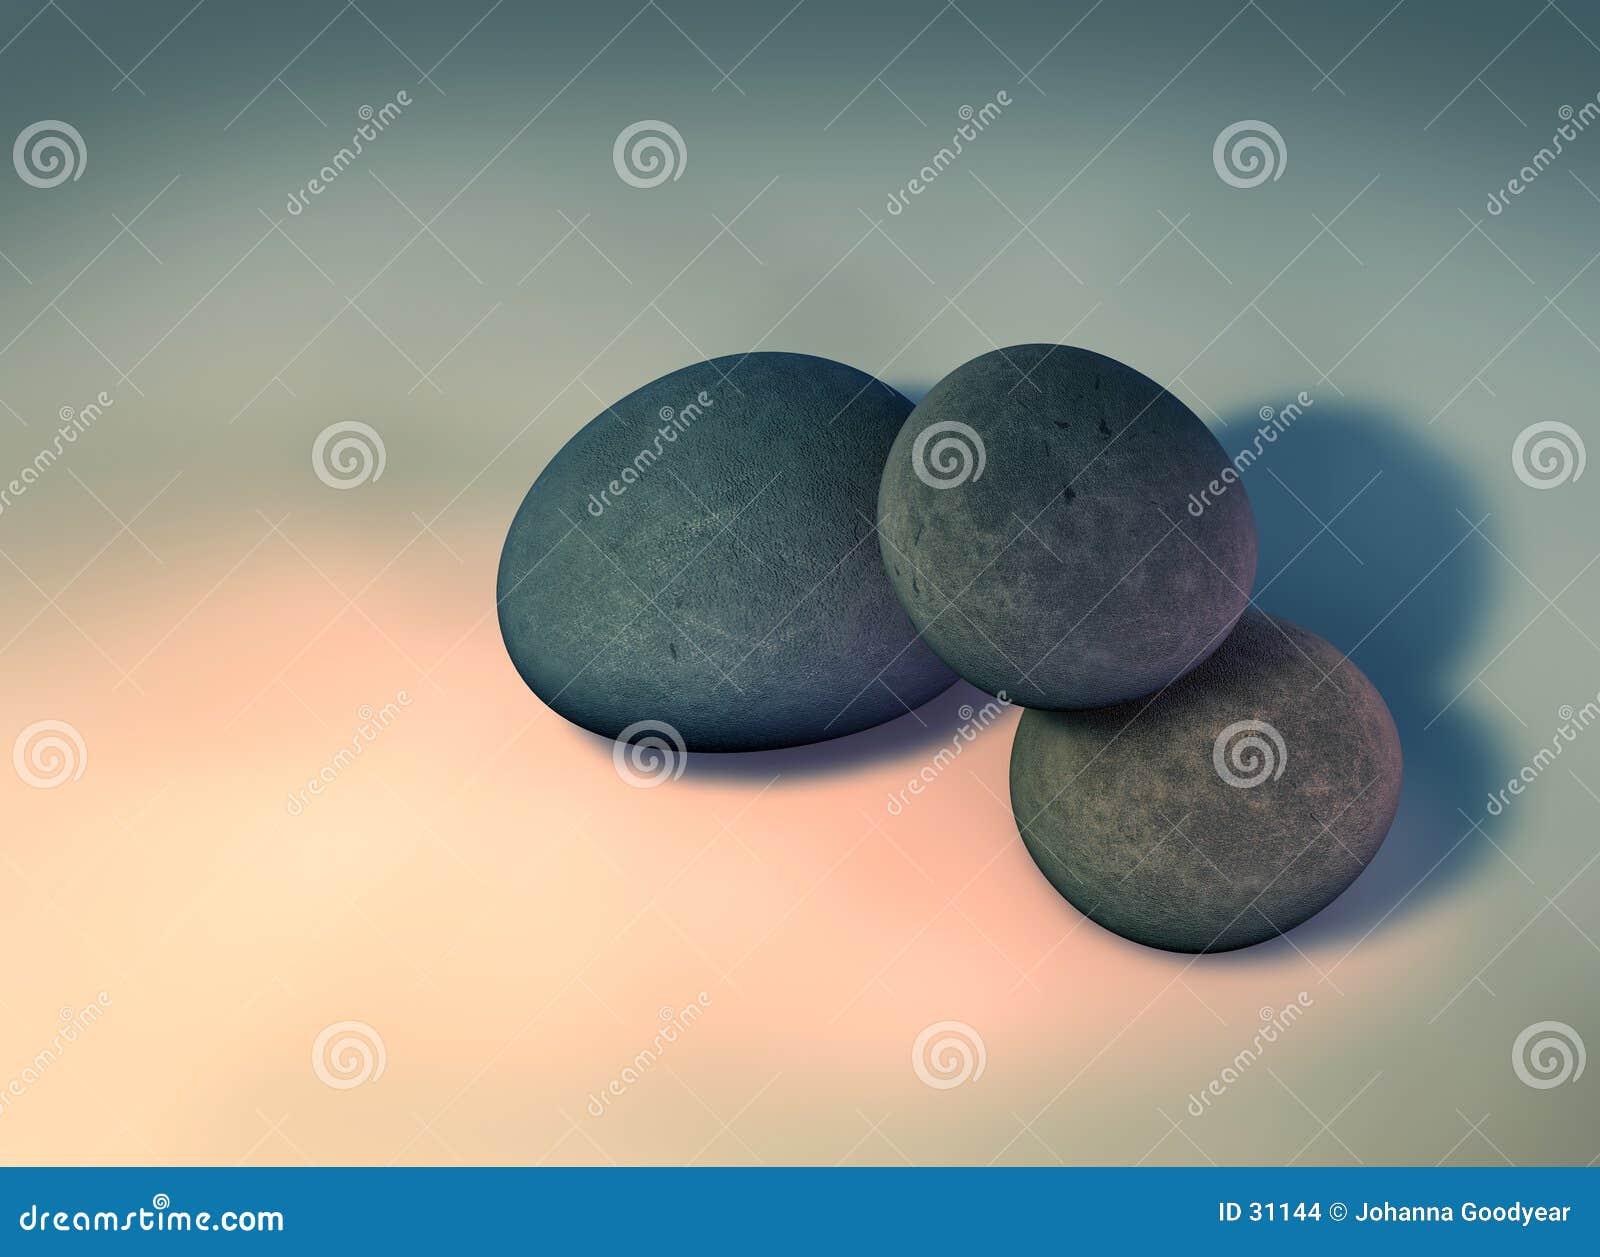 2 pebbles